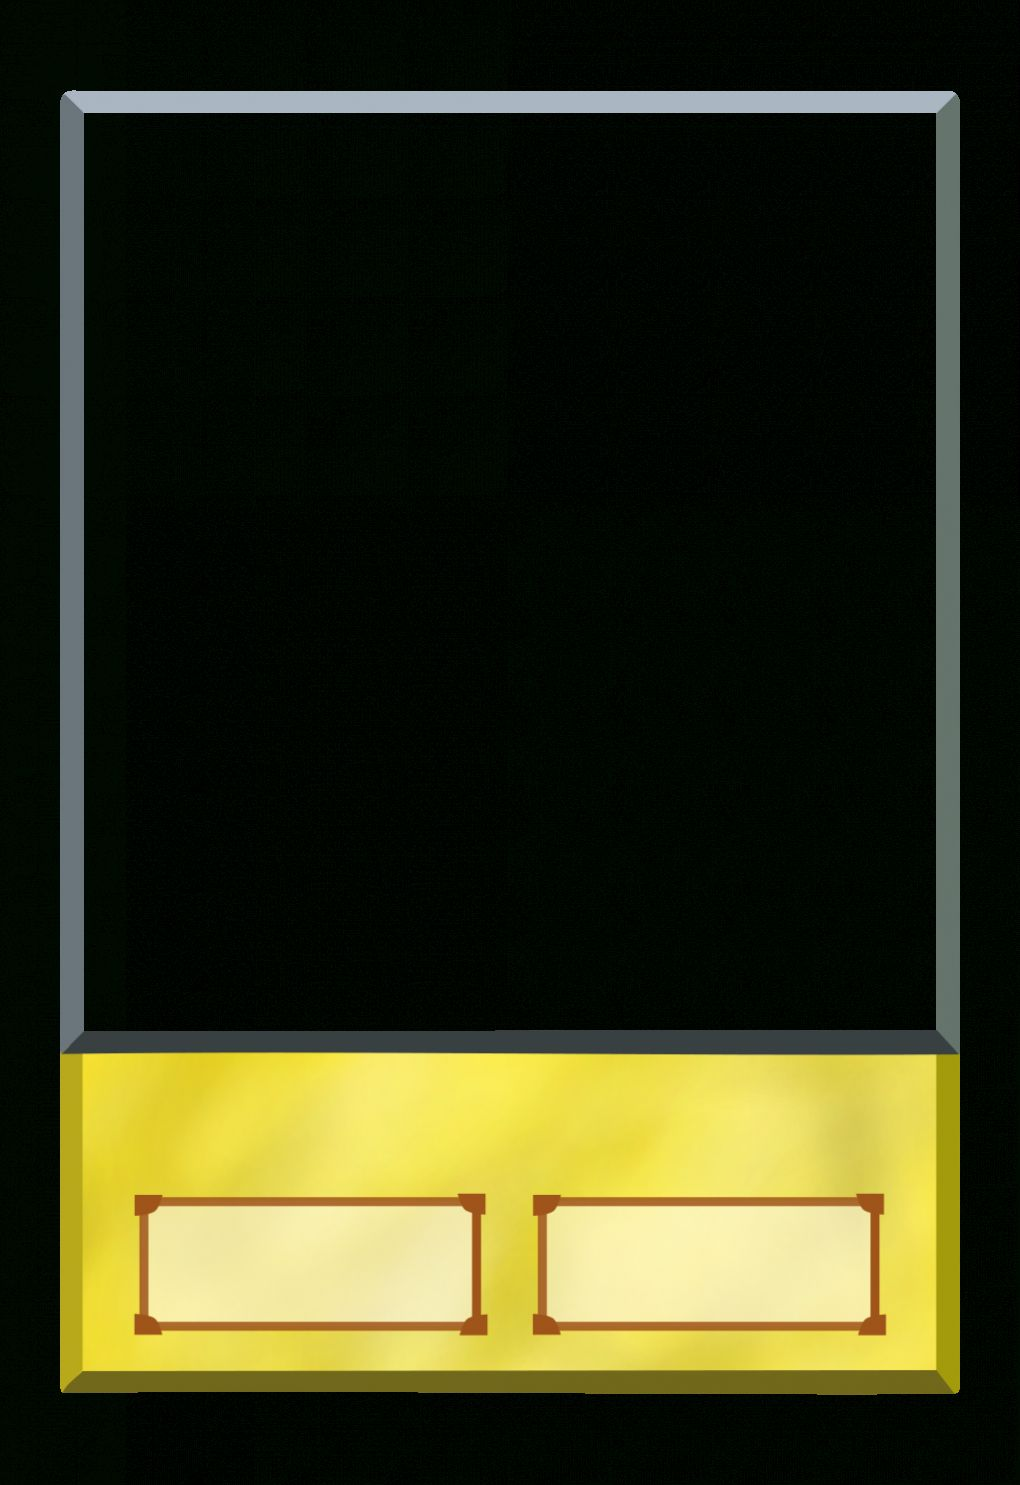 Yugioh Card Template Card Template Blank Card Template Templates